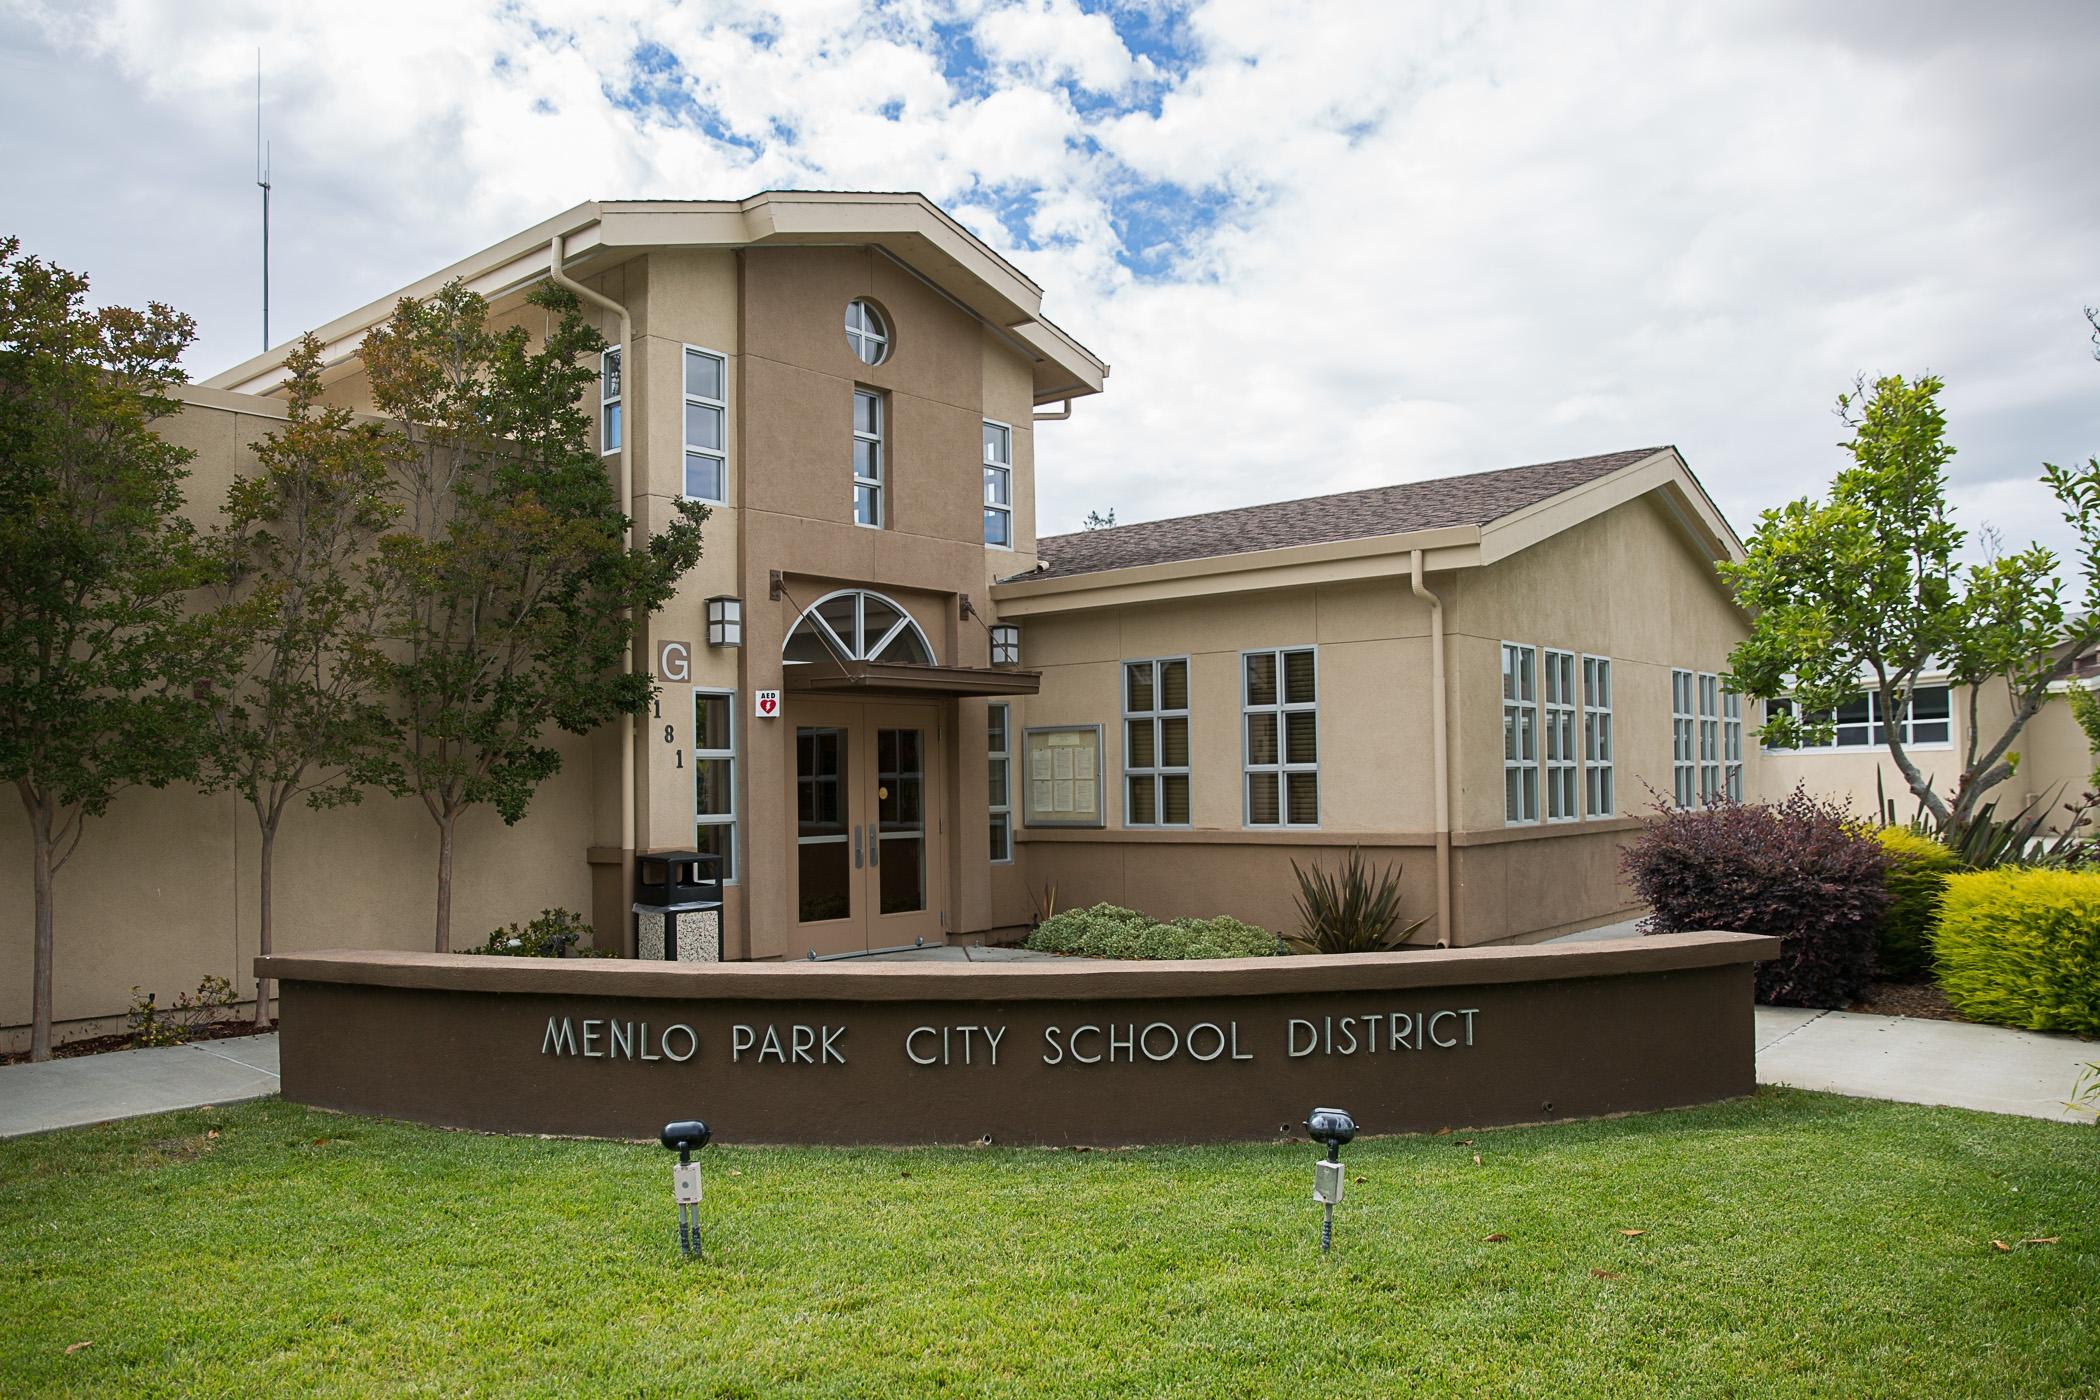 Hillsborough County Schools Calendar 2022 23.Defeat Of Prop 15 Denies Schools More Revenue News Almanac Online